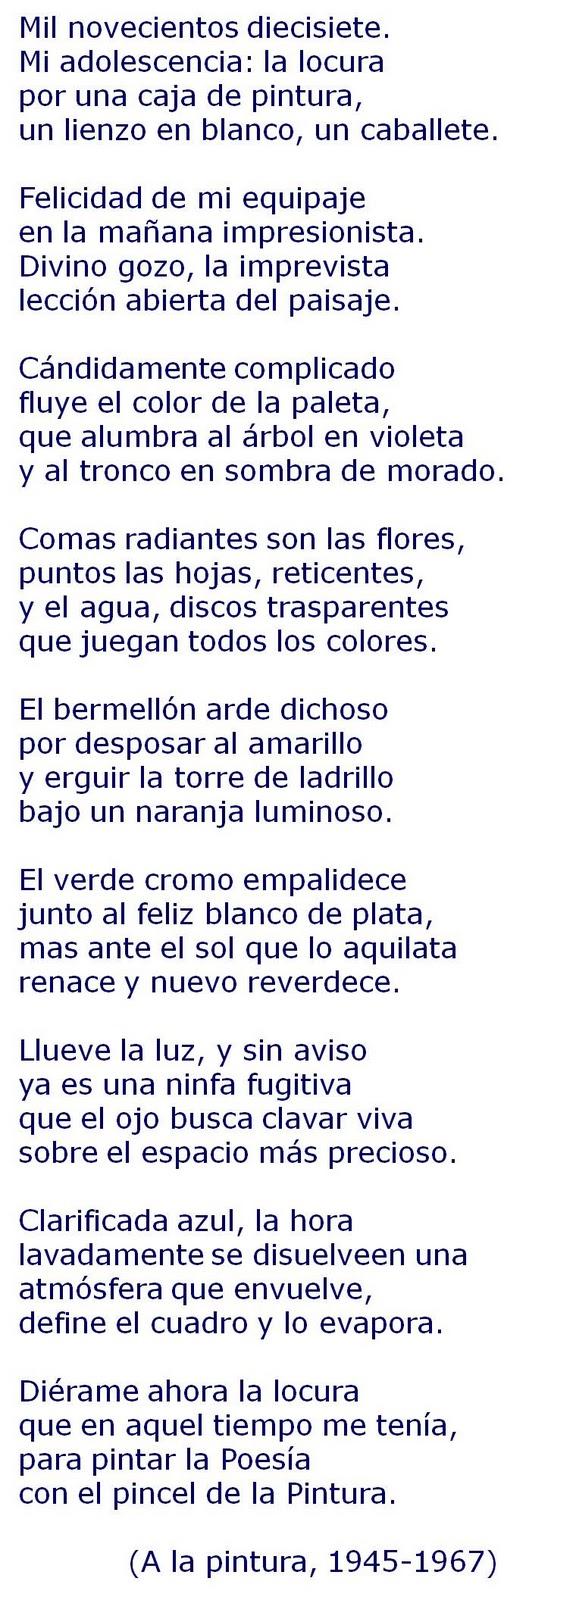 Poemas De La Vanguardia: Caligrama de un Rayo (Cubismo) - twiwa.mine